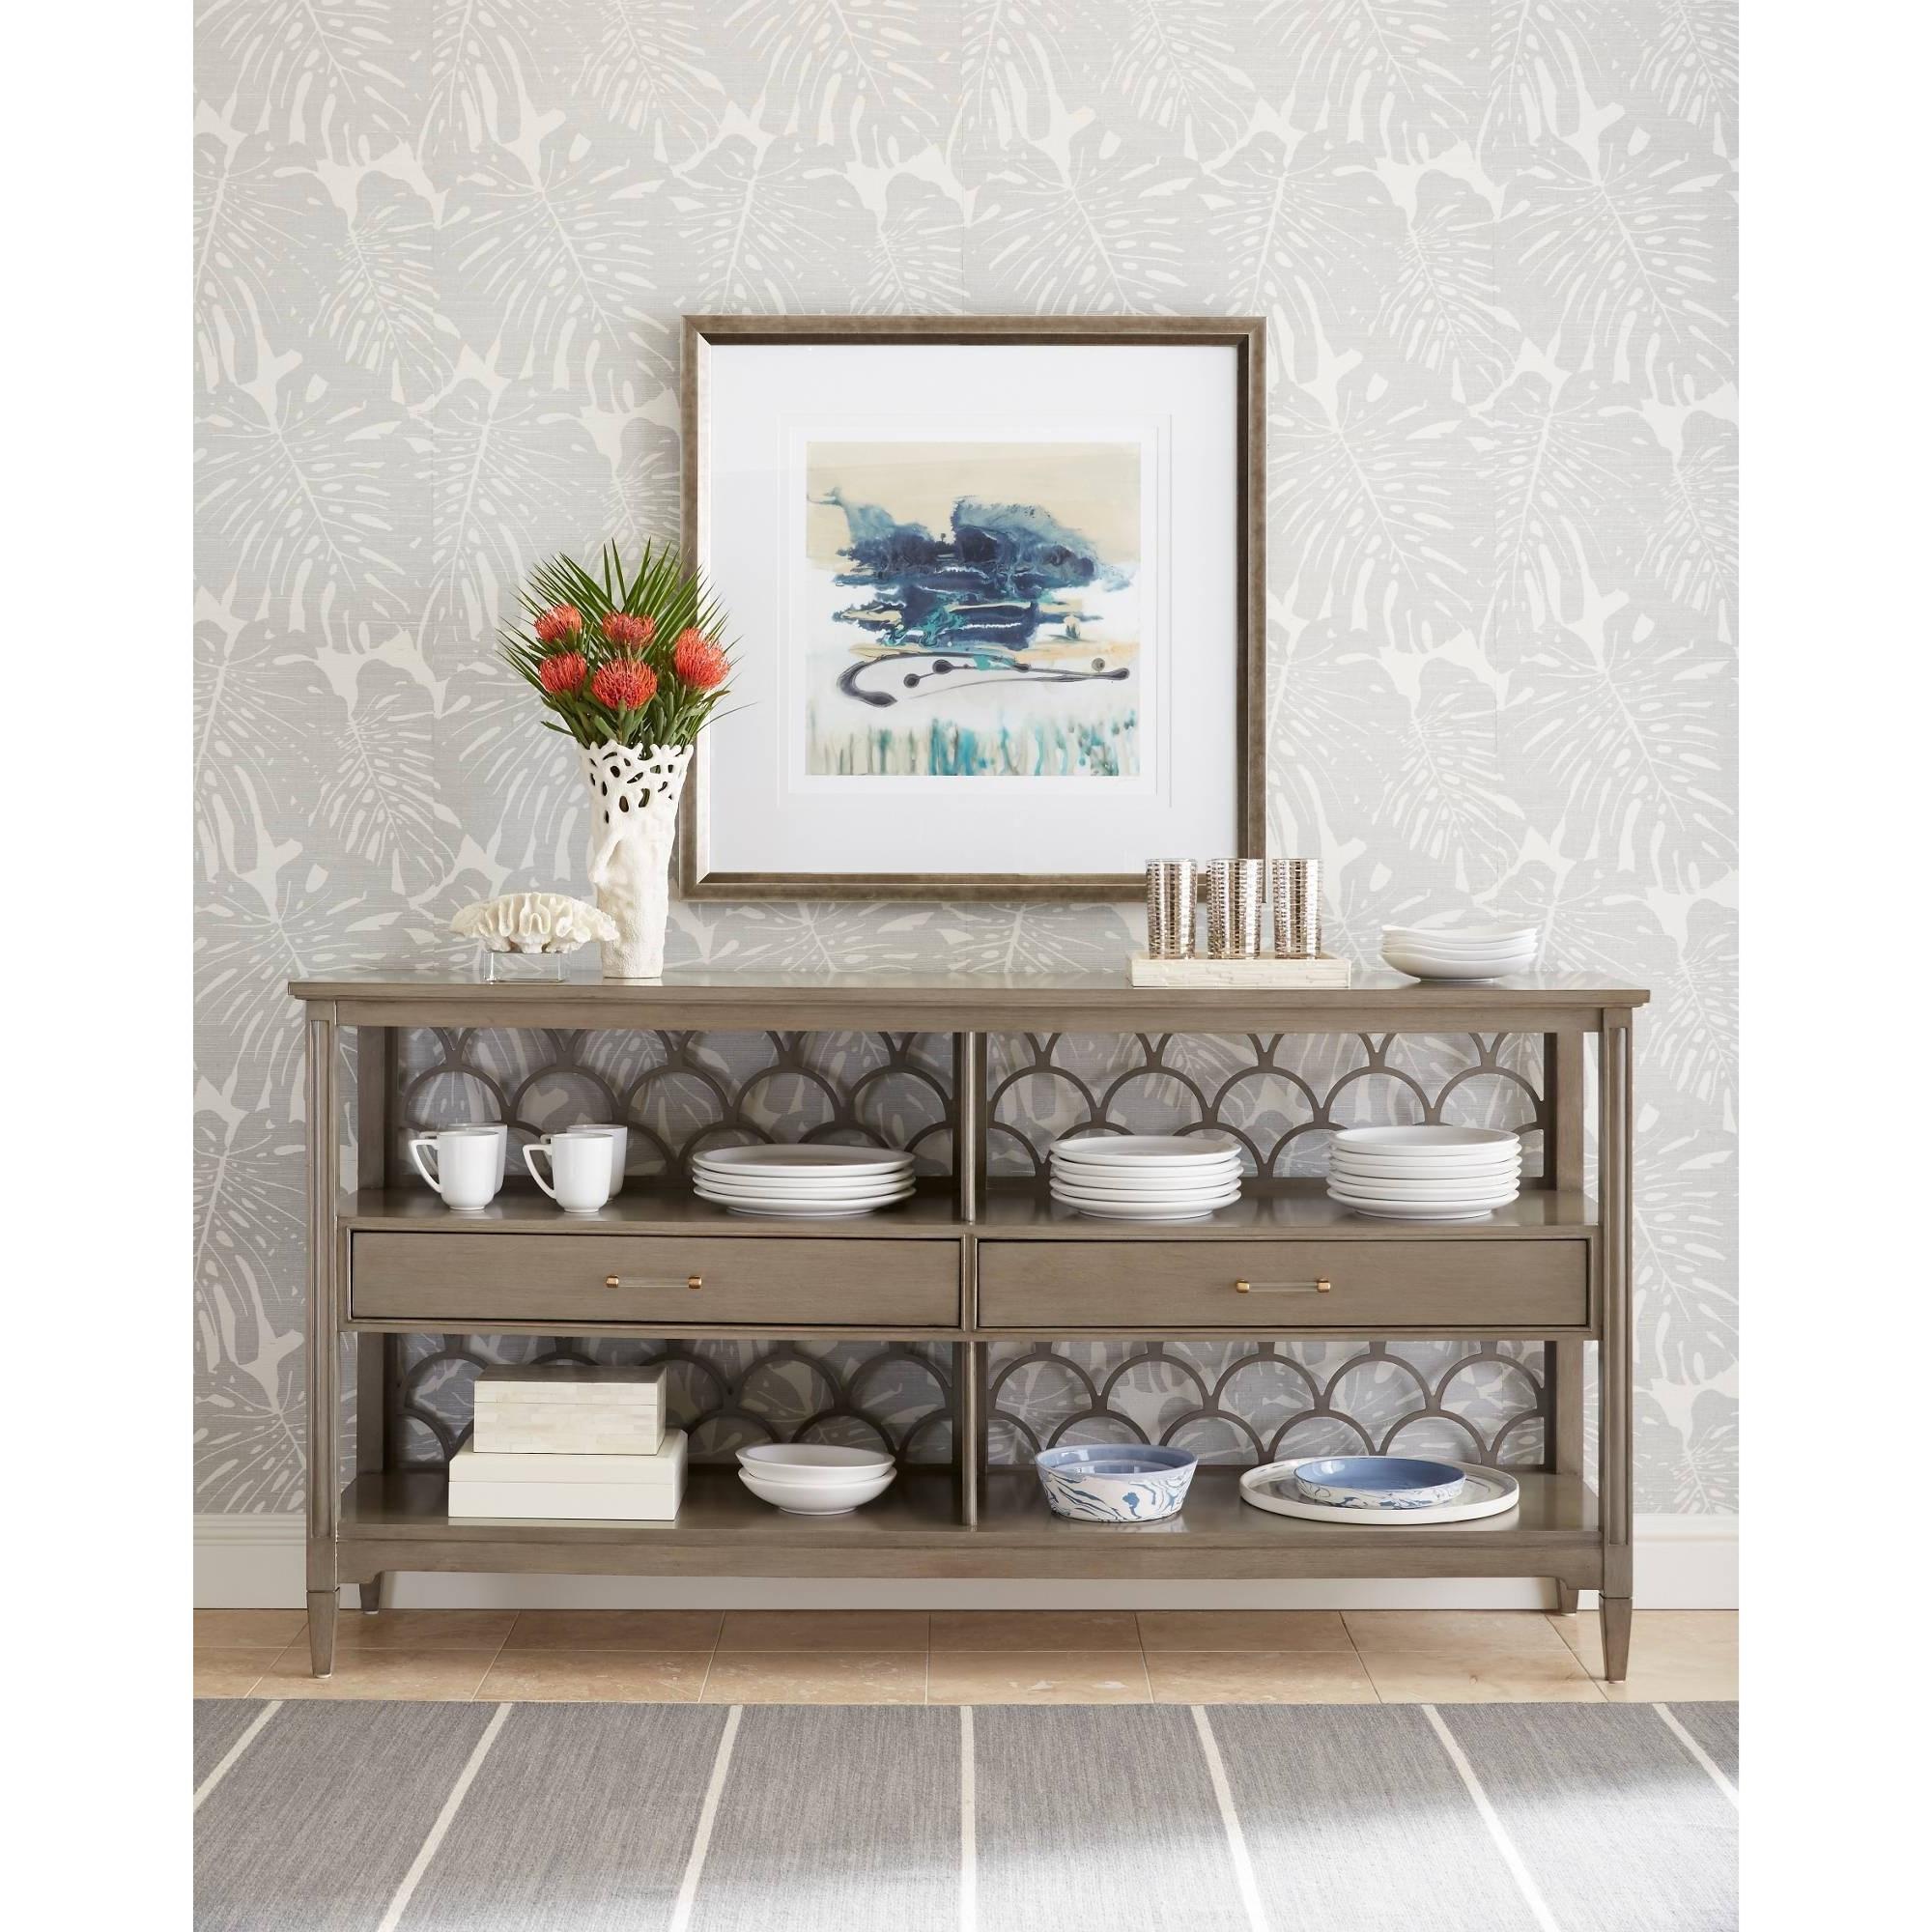 Stanley Furniture Coastal Living Oasis 527 61 06 Sea Cloud